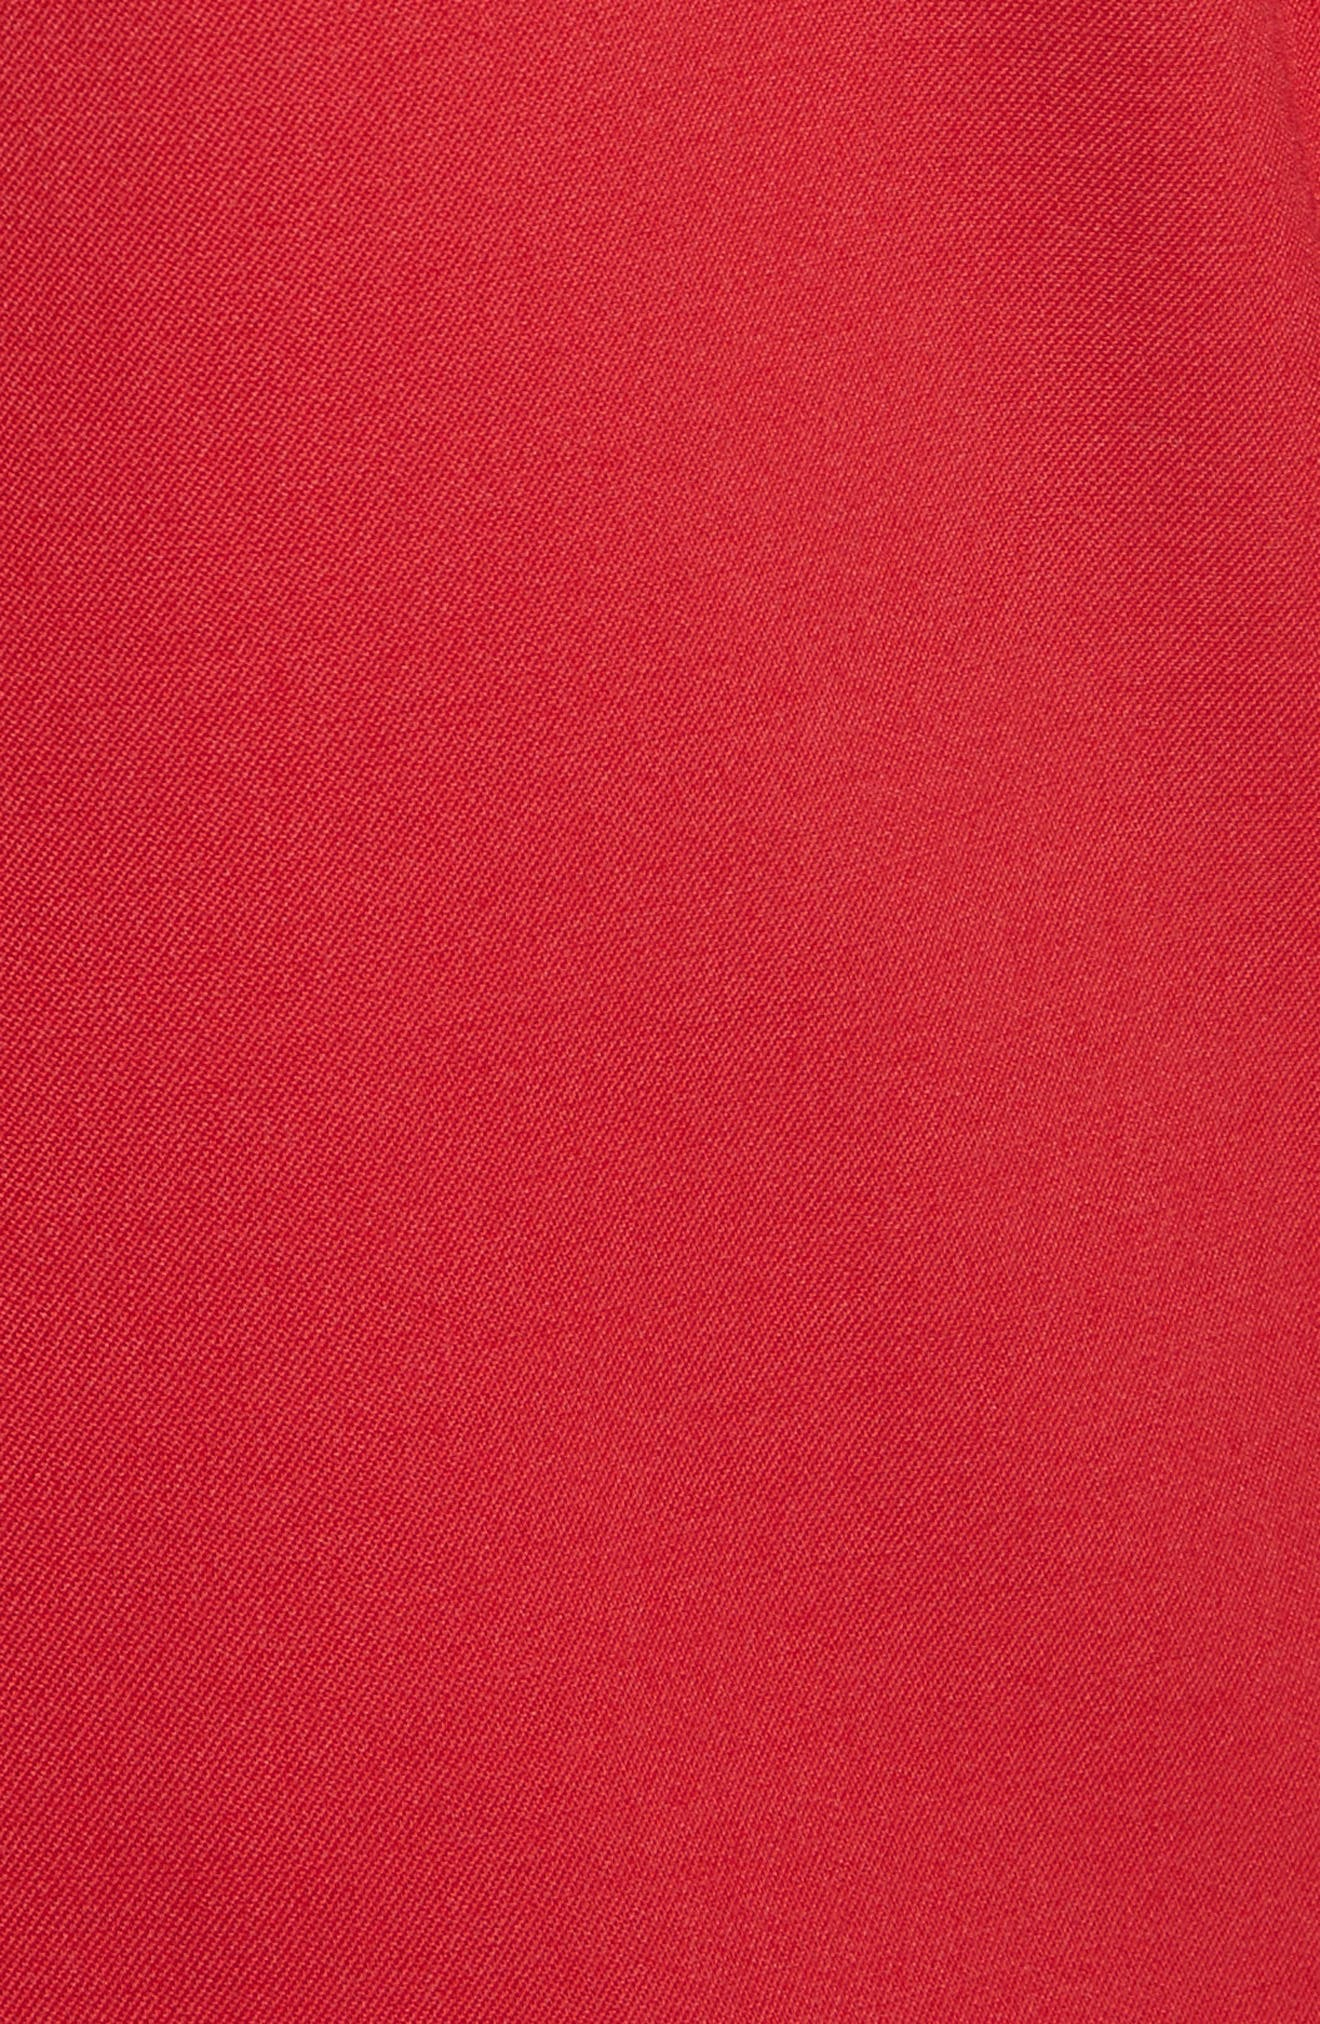 Alternate Image 6  - Oscar de la Renta Stretch Wool Boyfriend Blazer